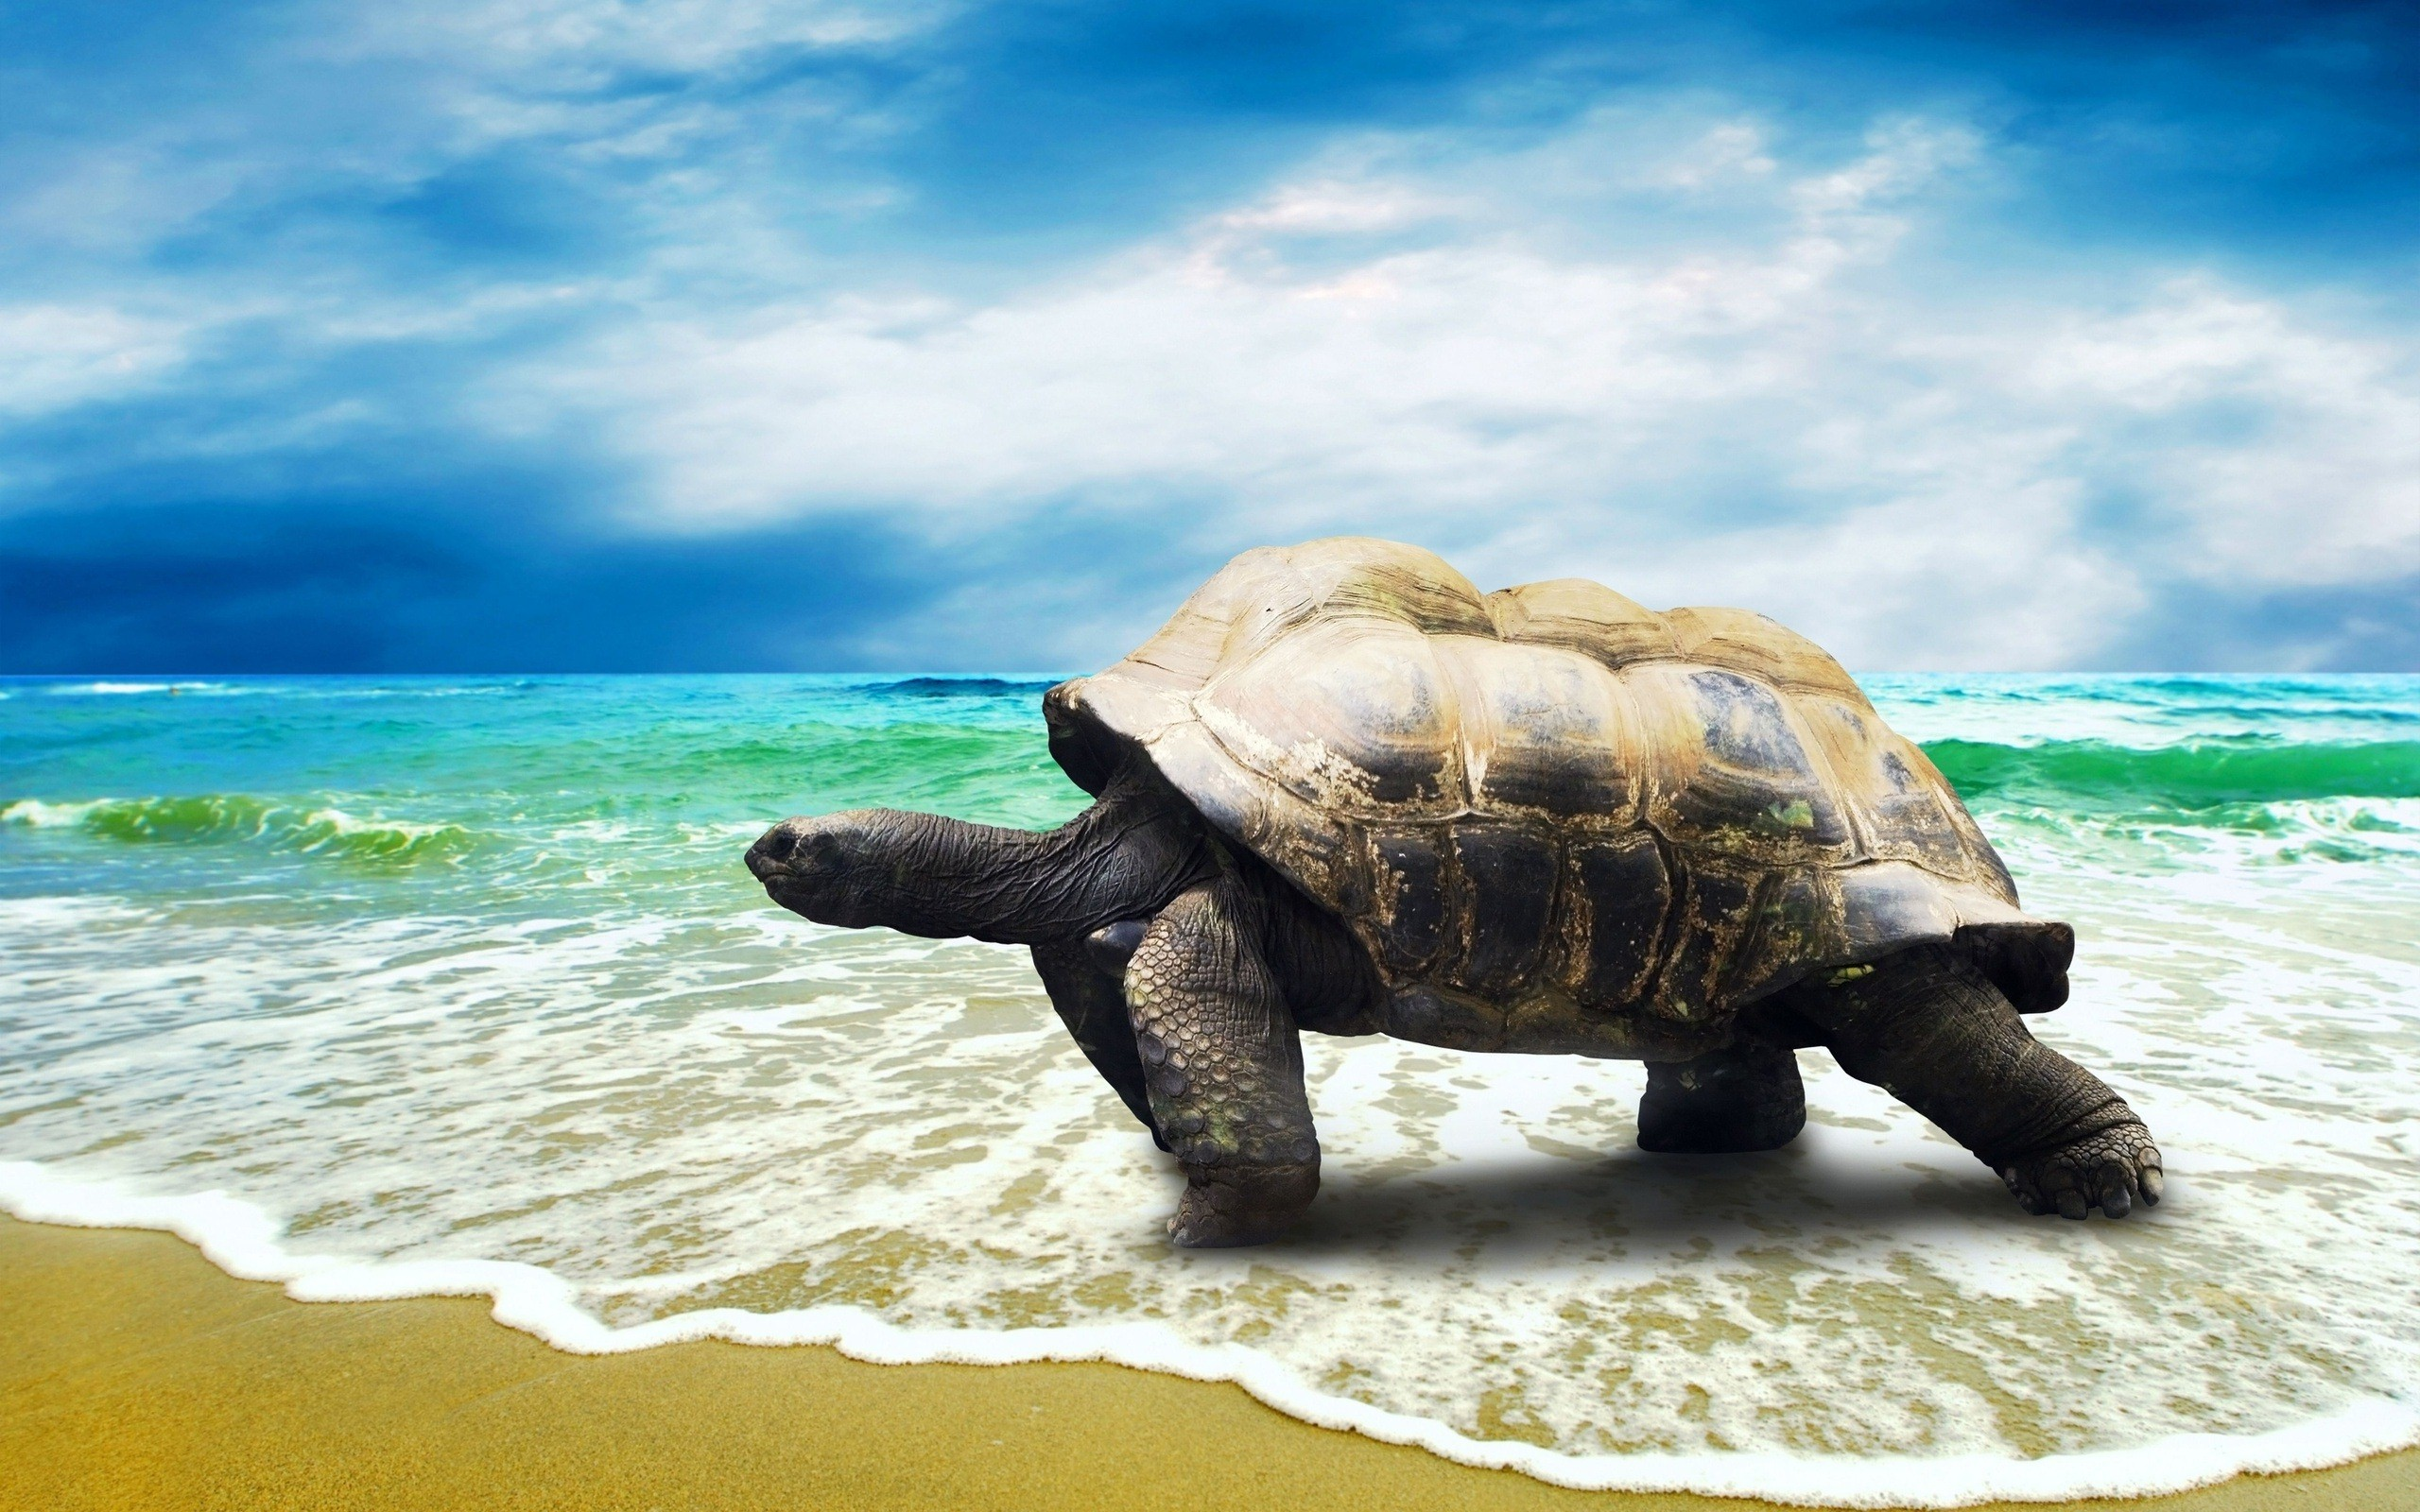 Big-Turtle-Walking-on-Beach-HD-Wallpapers